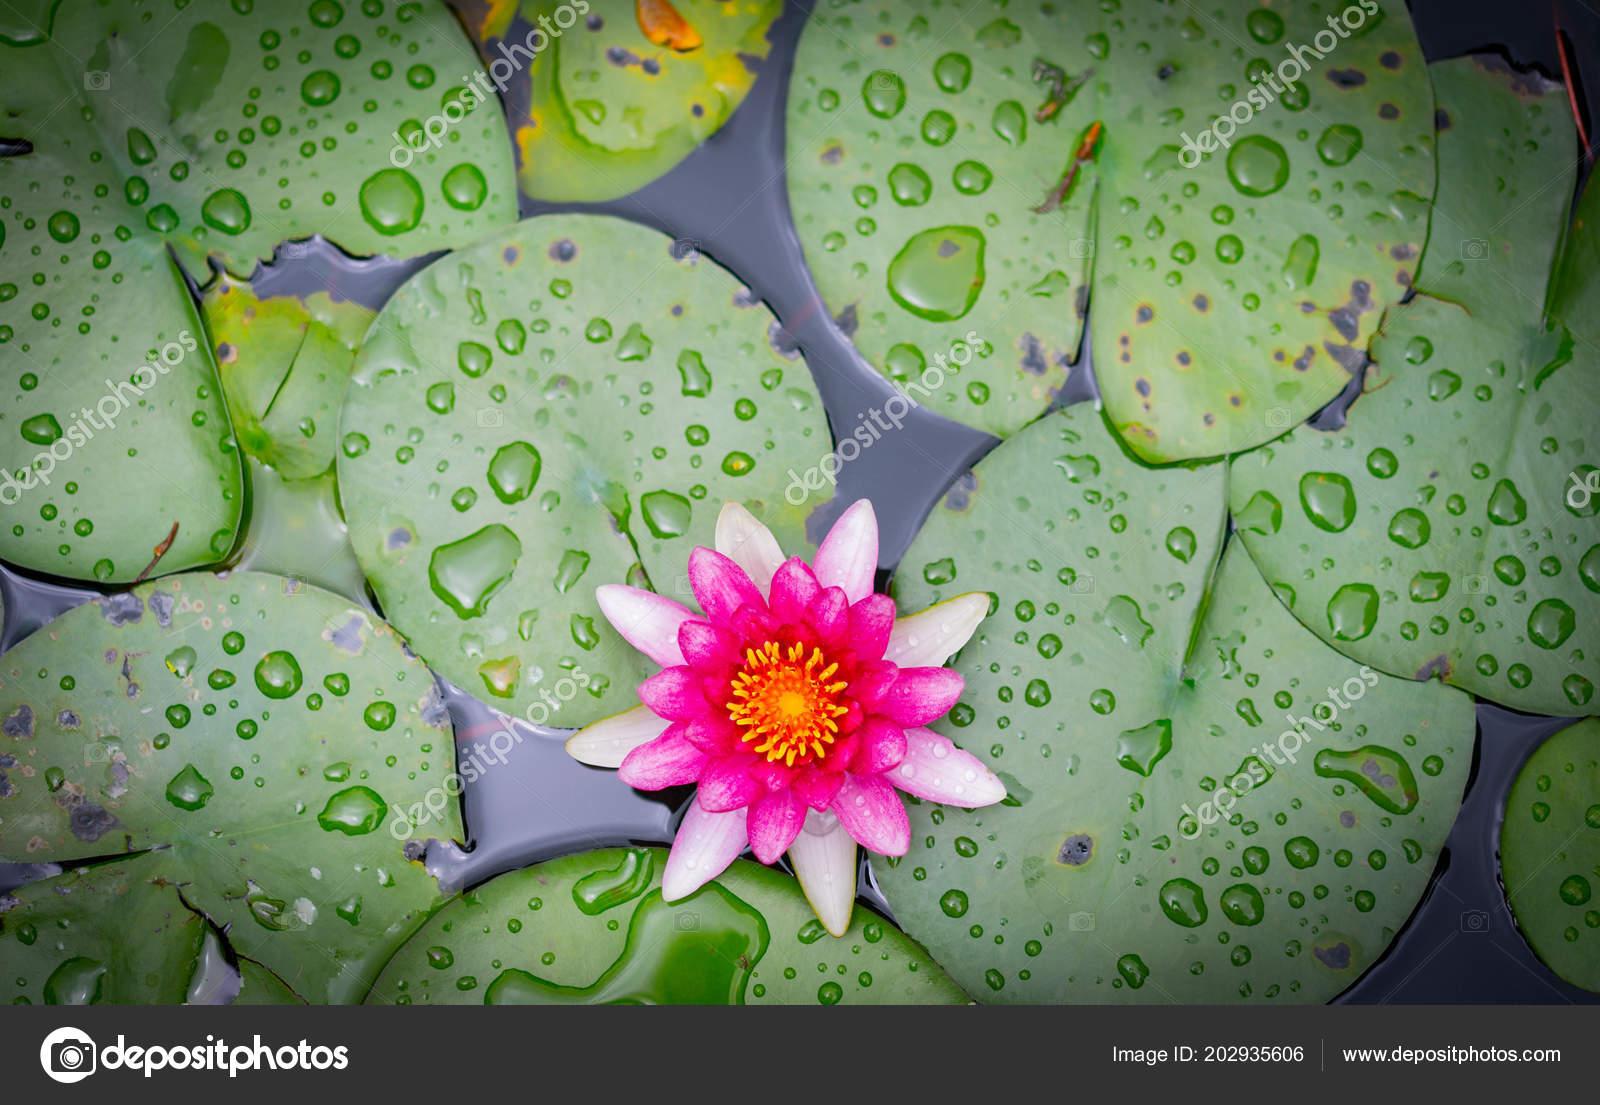 Beautiful lotus flower water garden stock photo nattanansia beautiful lotus flower on the water in garden photo by nattanansiahotmail izmirmasajfo